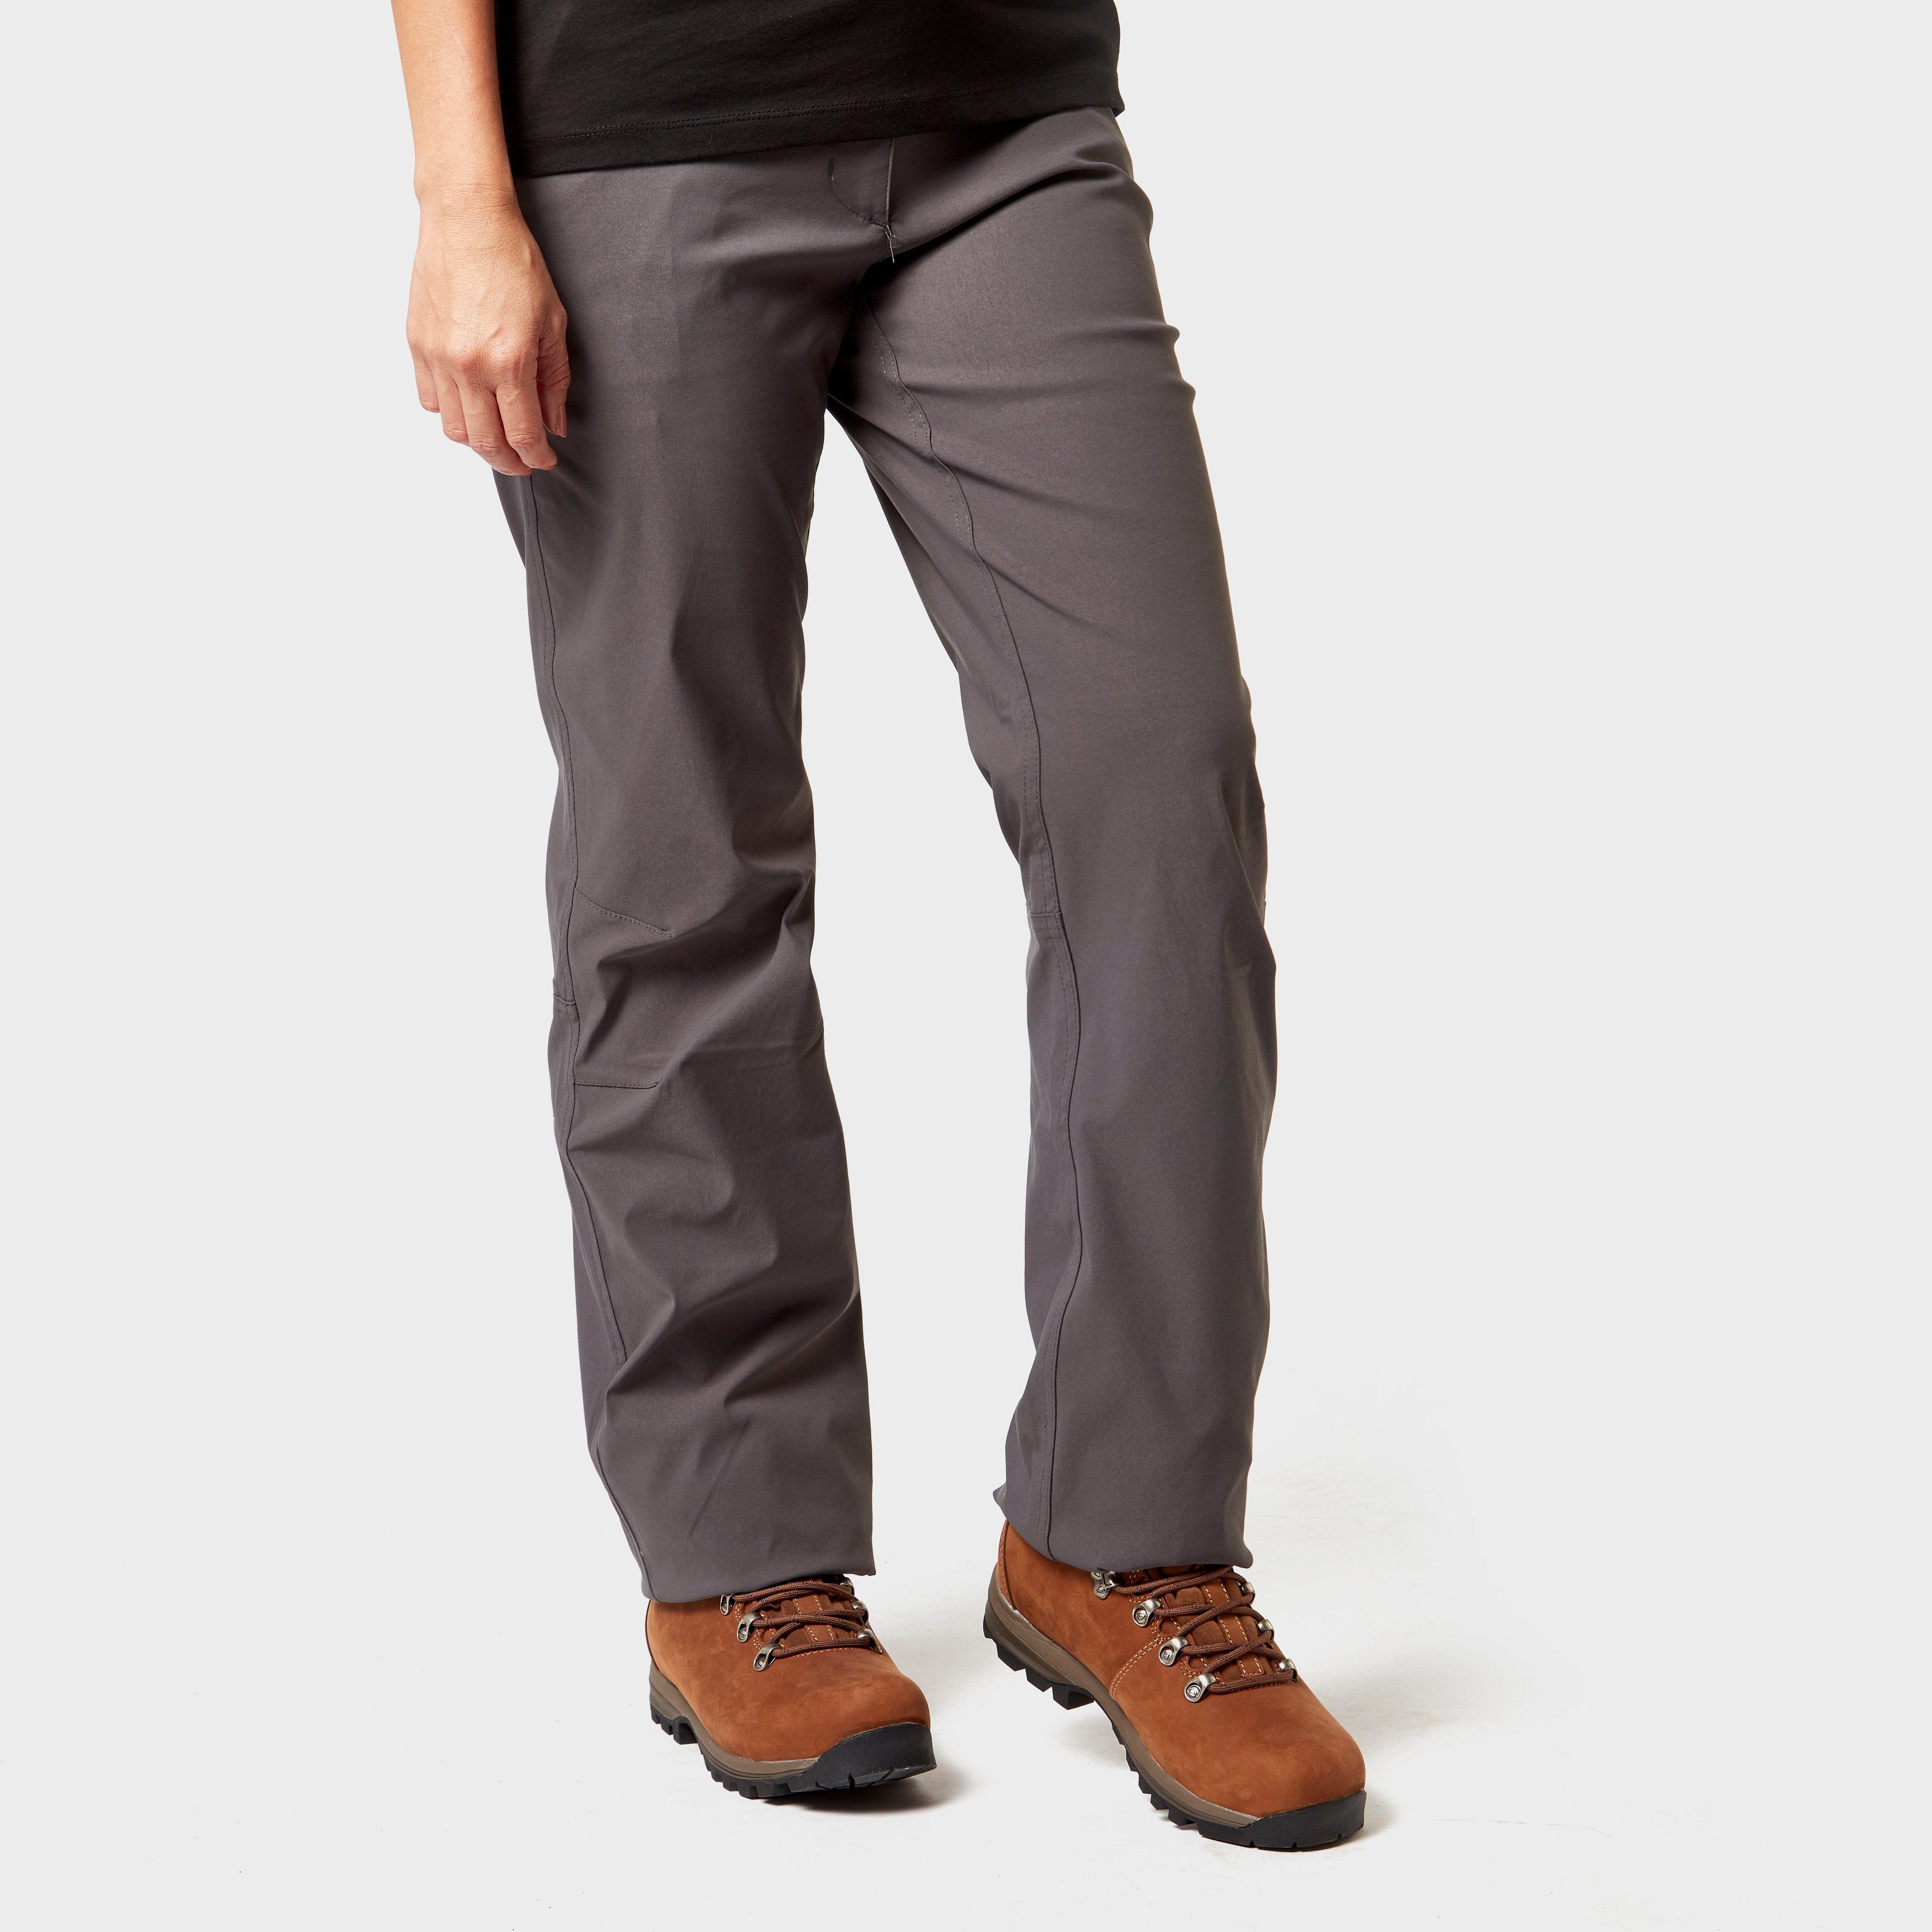 BRASHER Women's Stretch Trousers